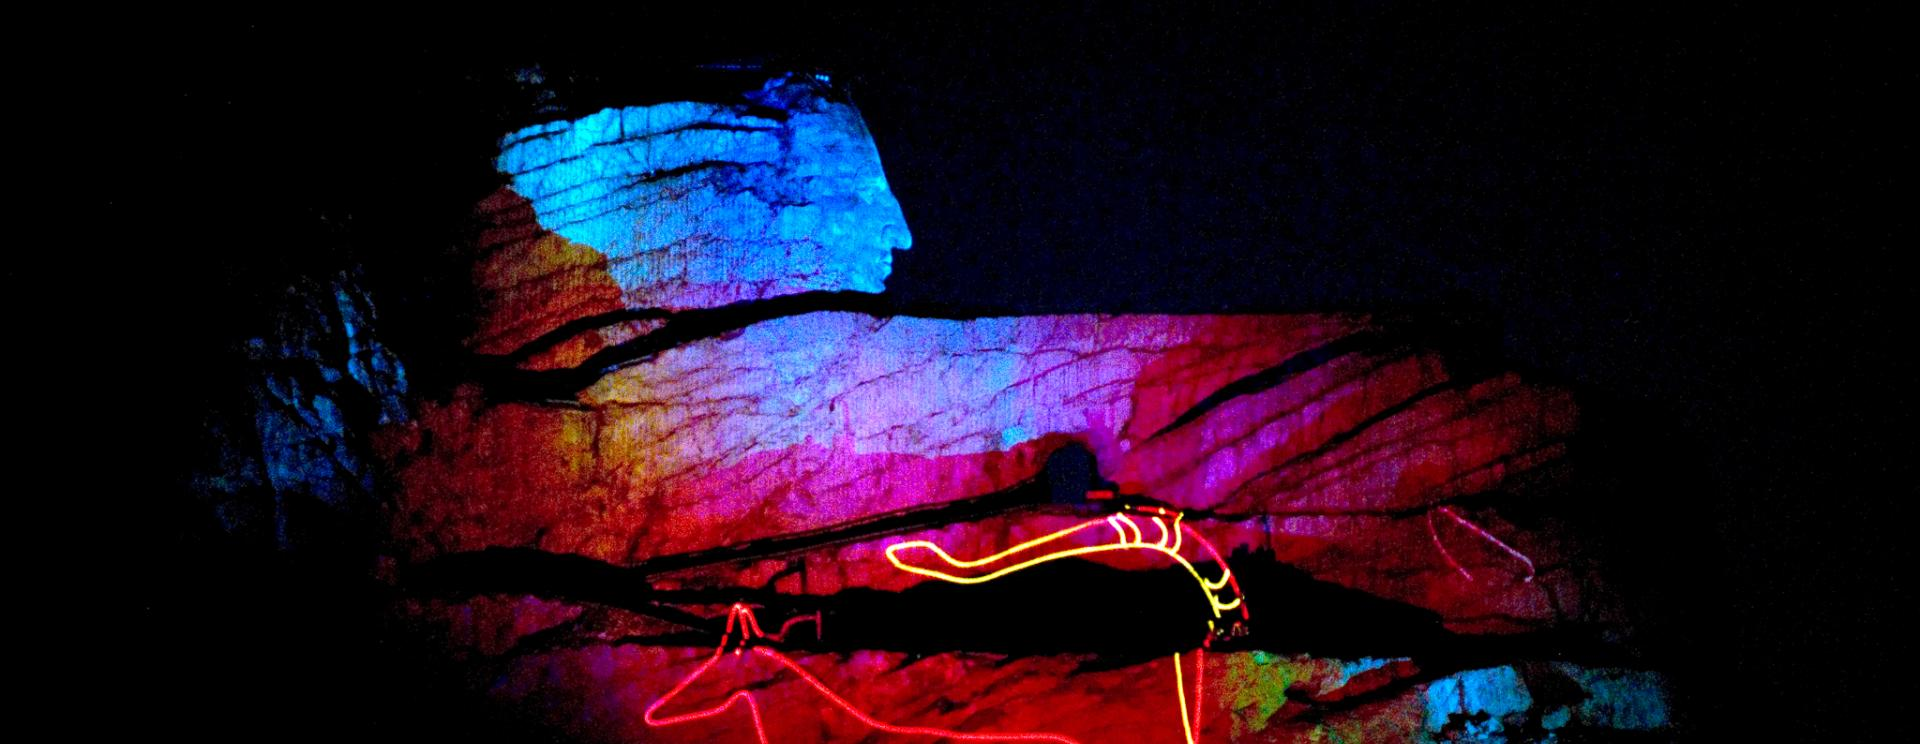 Crazy Horse Memorial Black Hills Badlands South Dakota